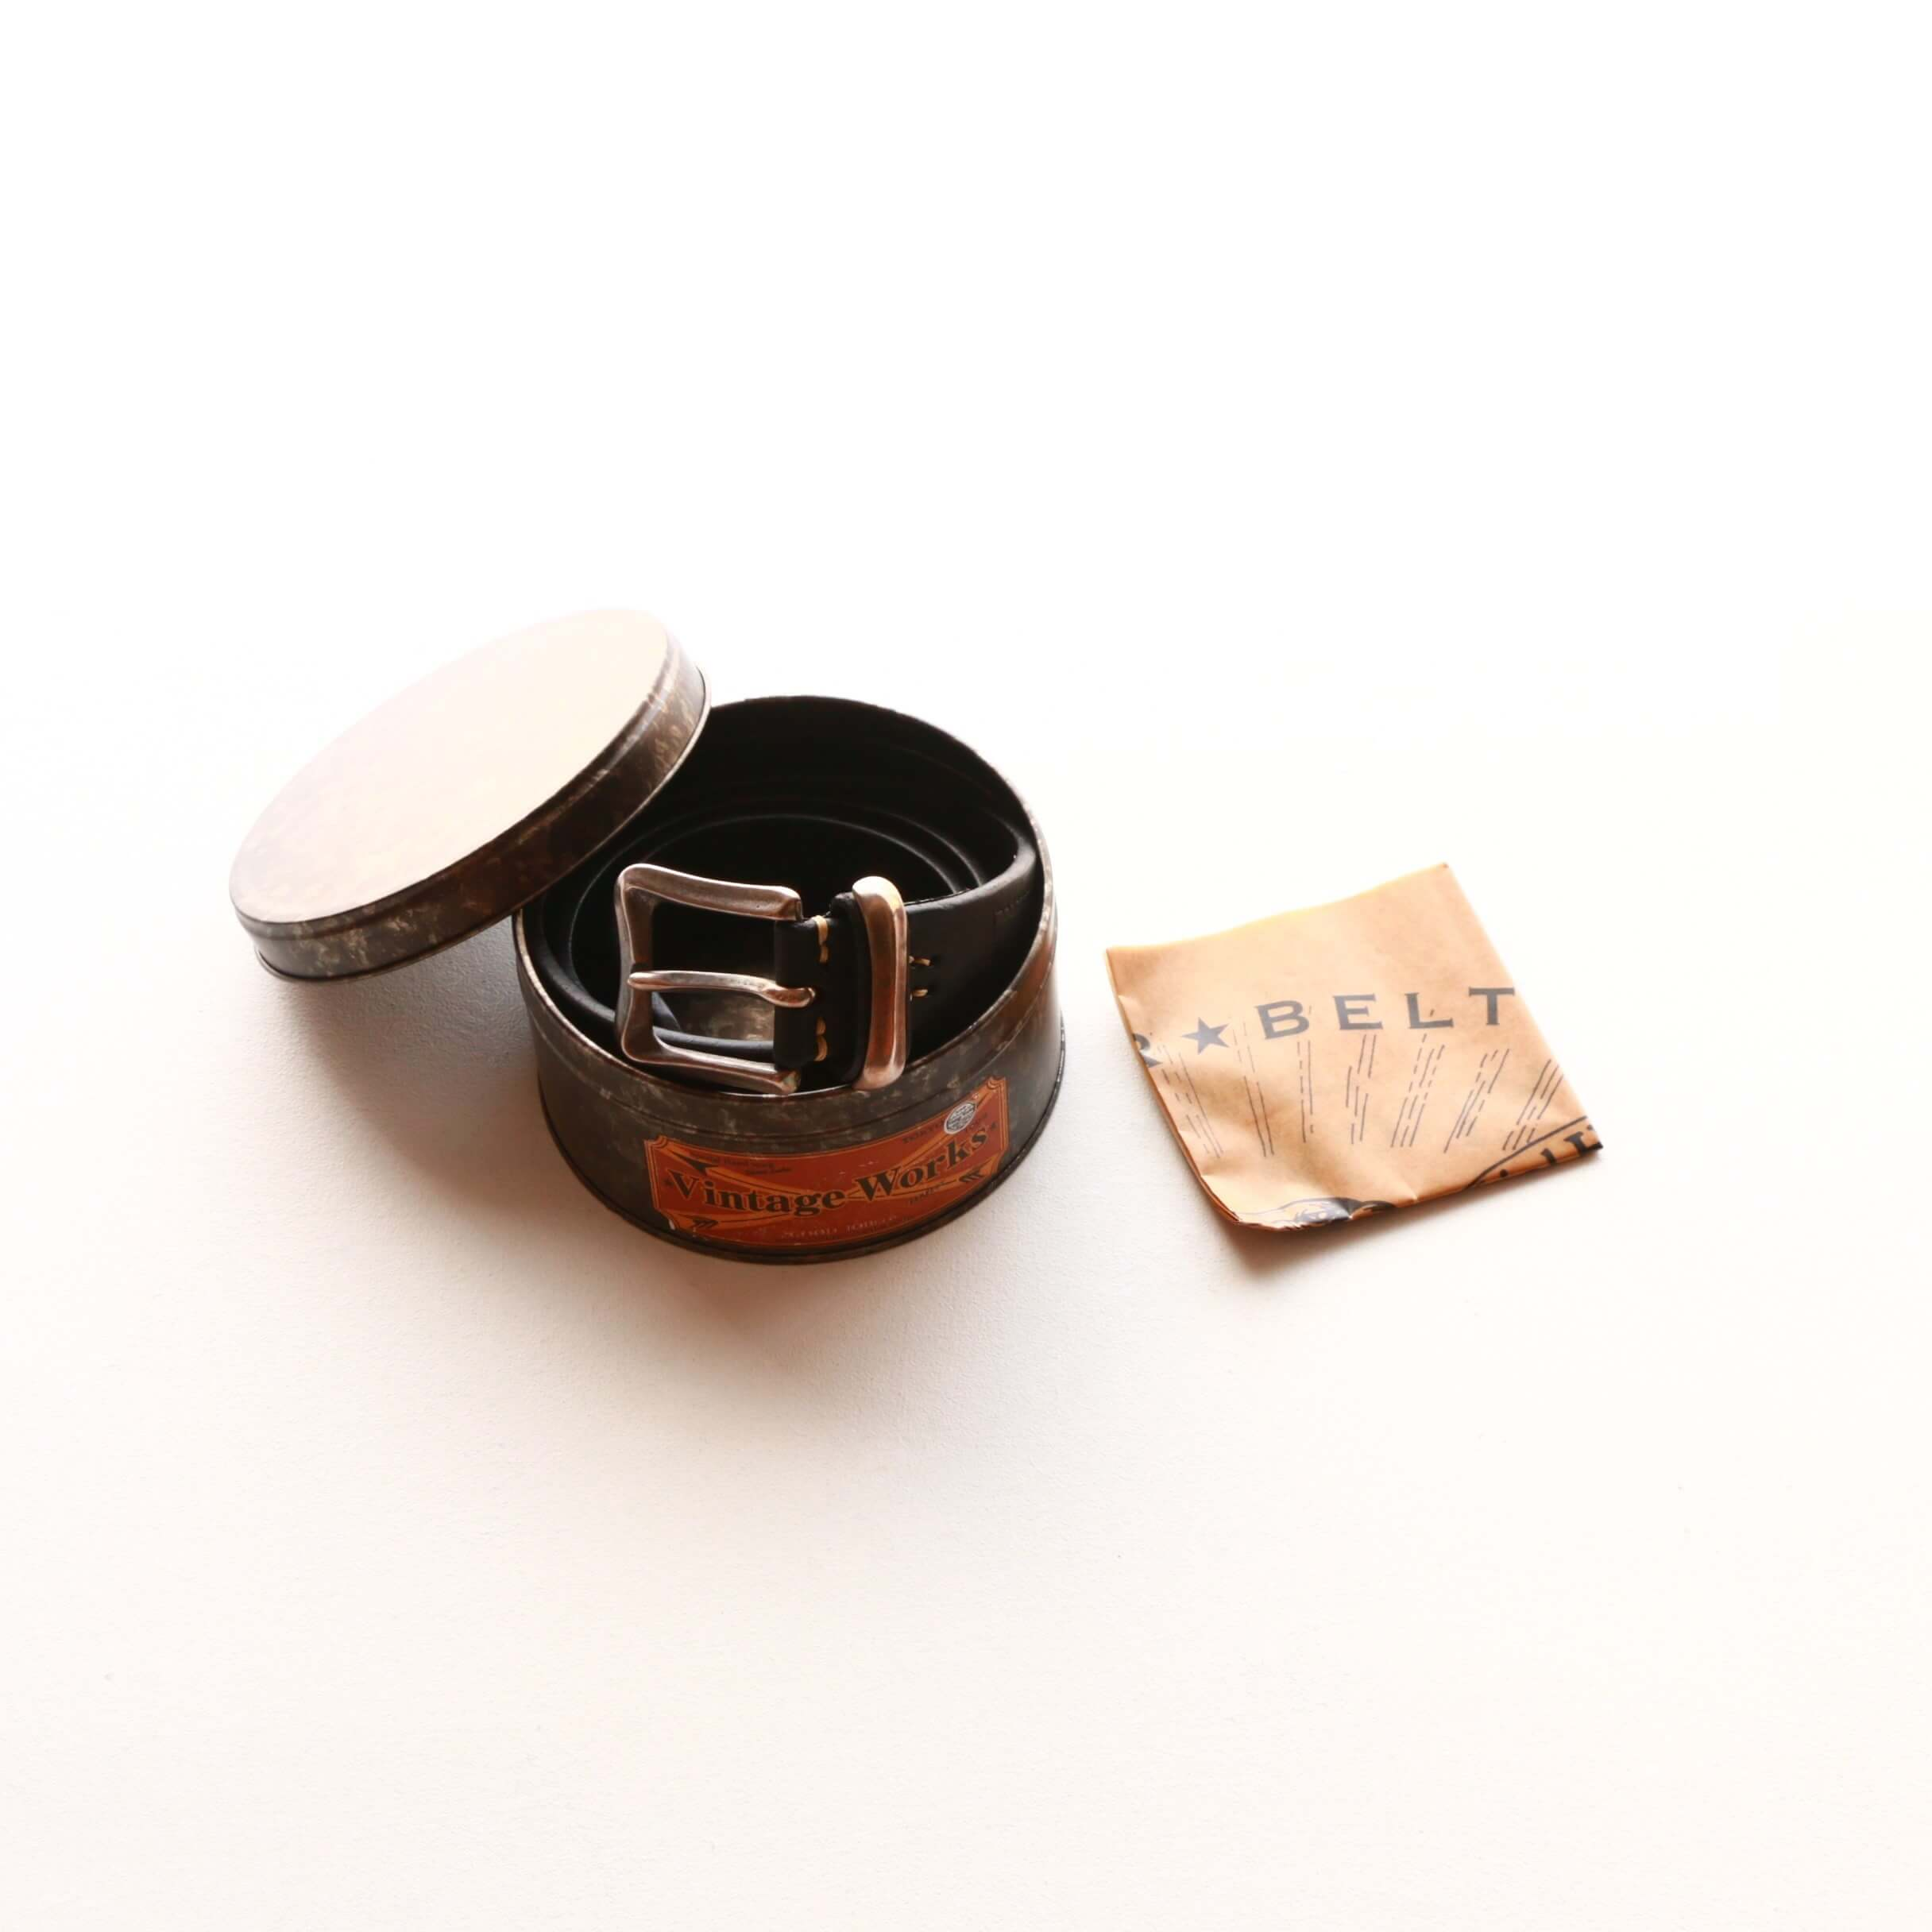 Vintage Works ヴィンテージワークス Leather belt 5Hole レザーベルト 5ホール DH5675